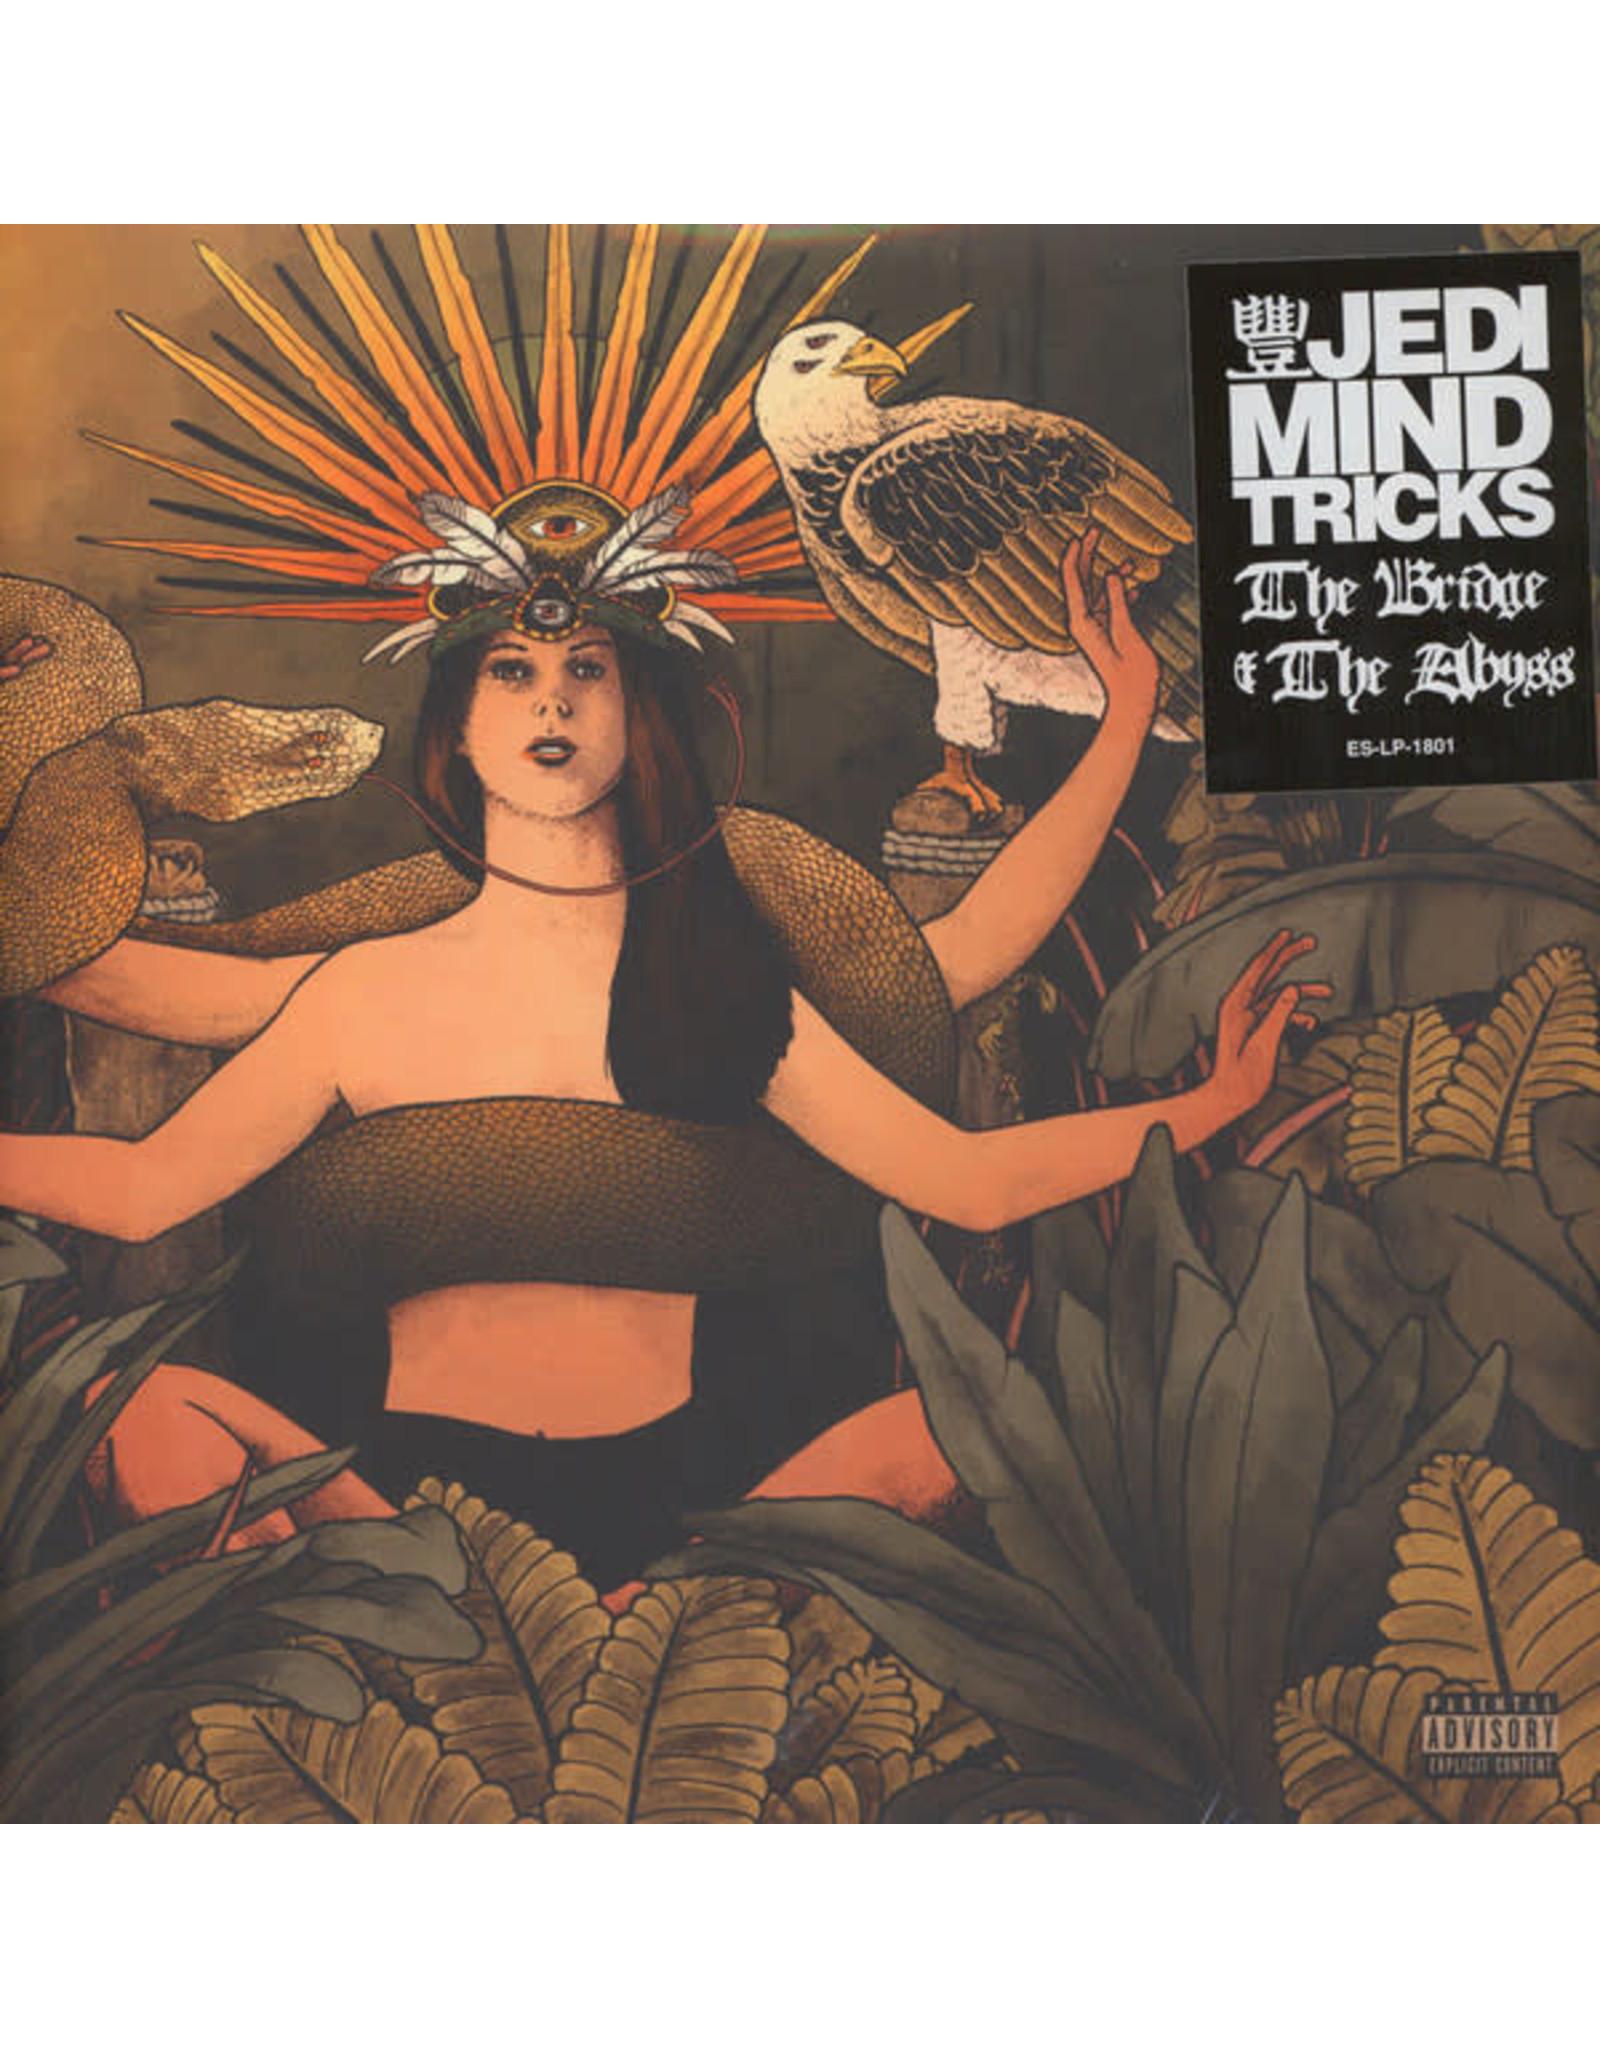 New Vinyl Jedi Mind Tricks - The Bridge & The Abyss 2LP